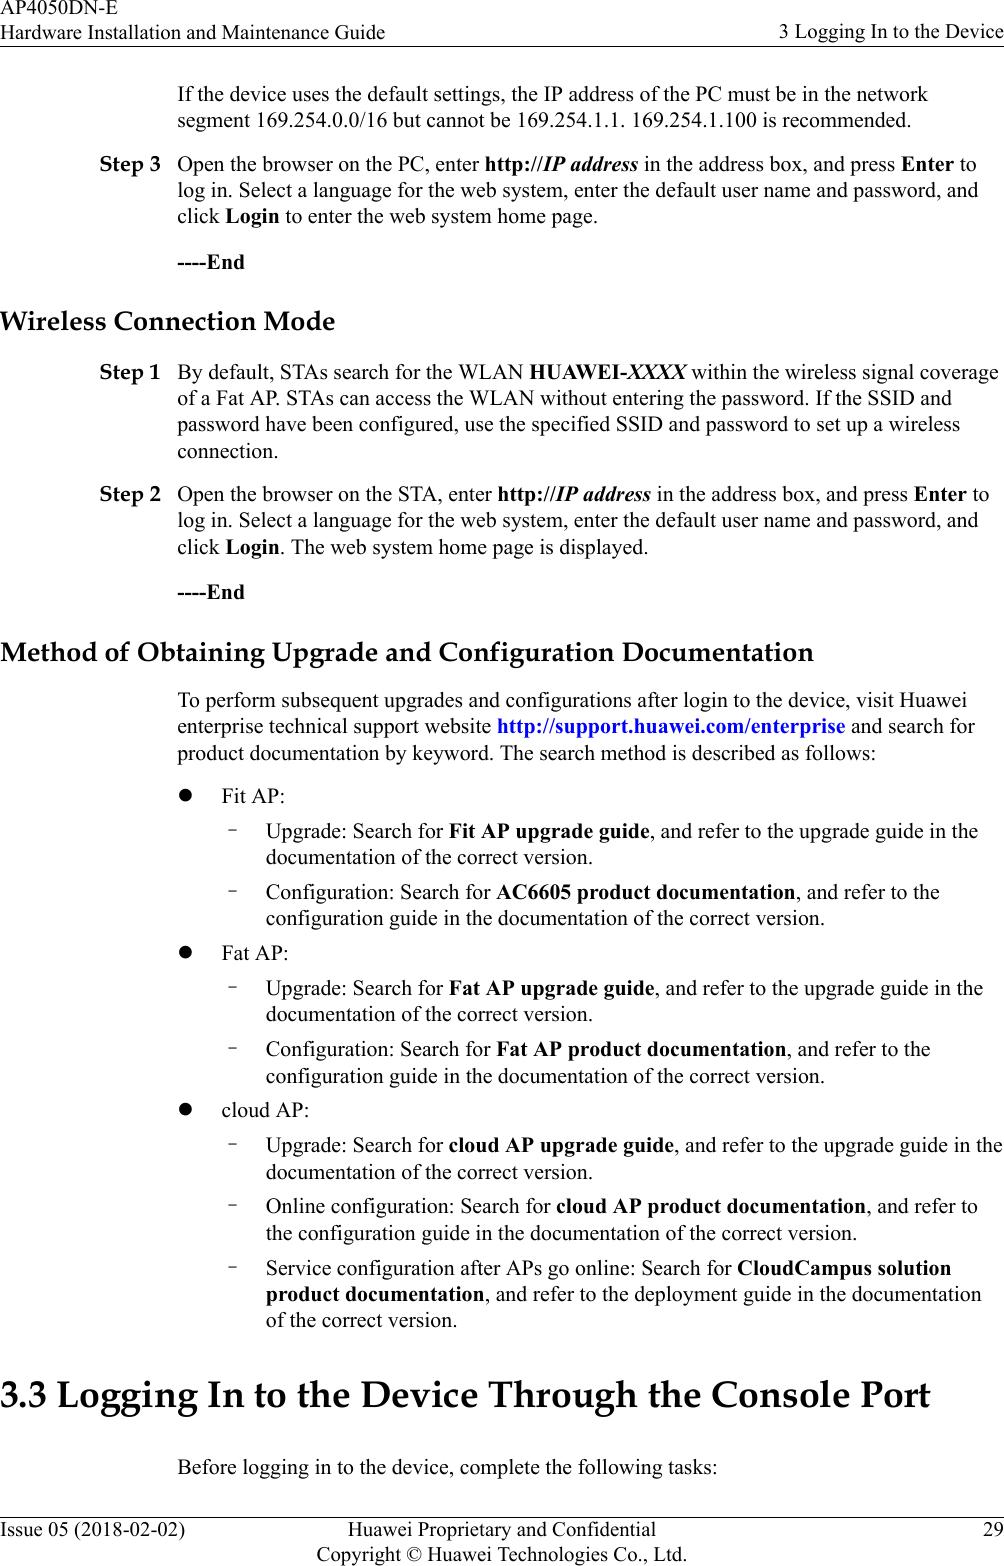 Huawei Technologies AP4050DN-E Wireless LAN Access Point User Manual